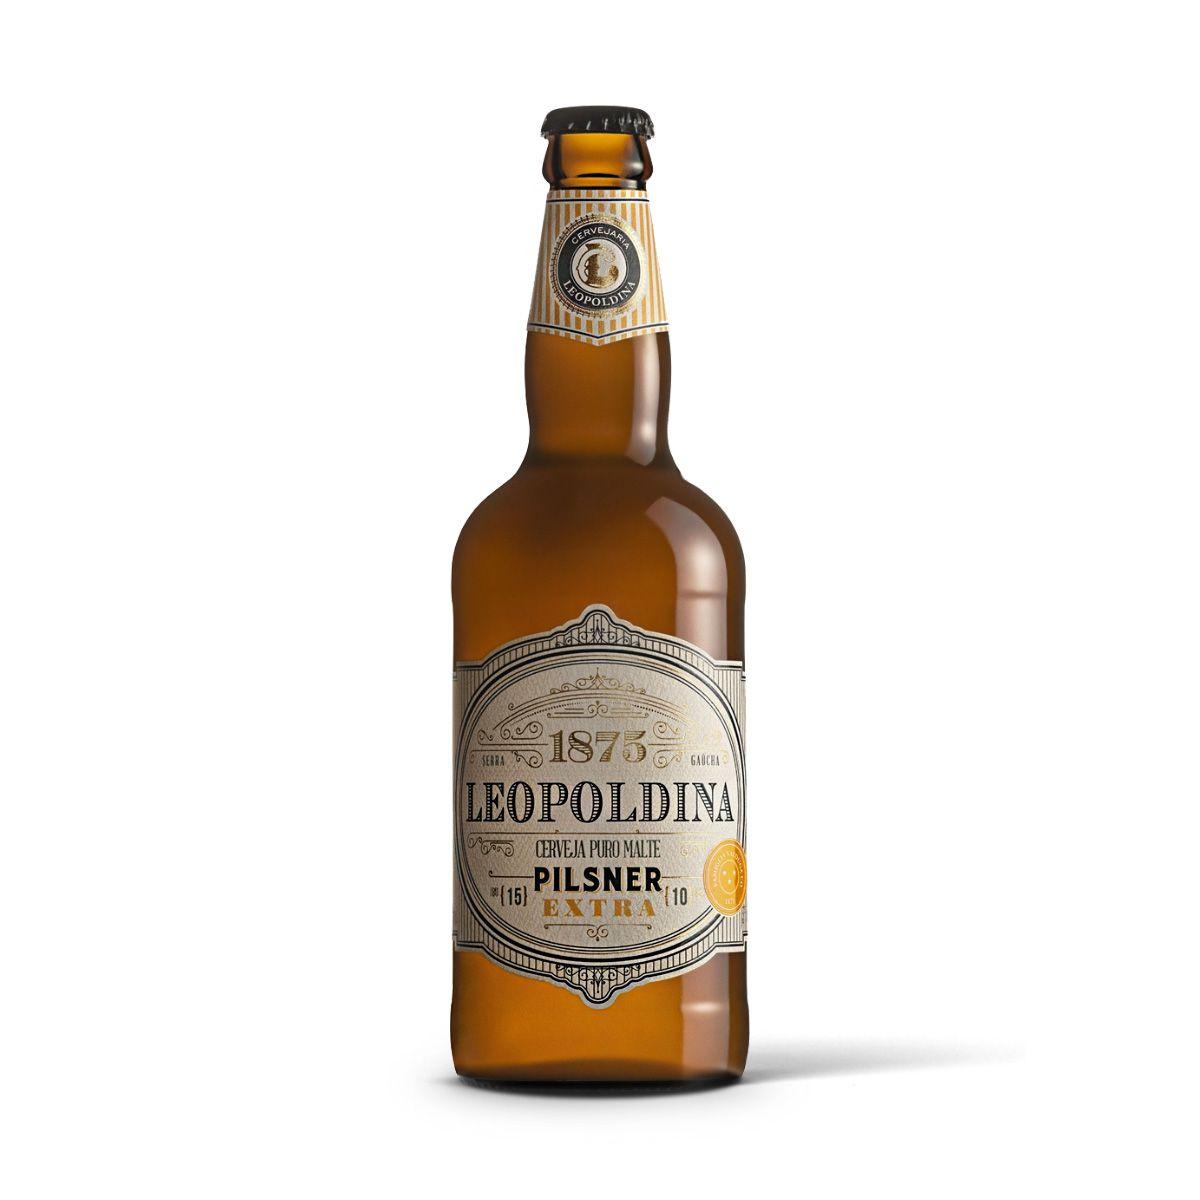 Leopoldina Pilsner Extra 500ml